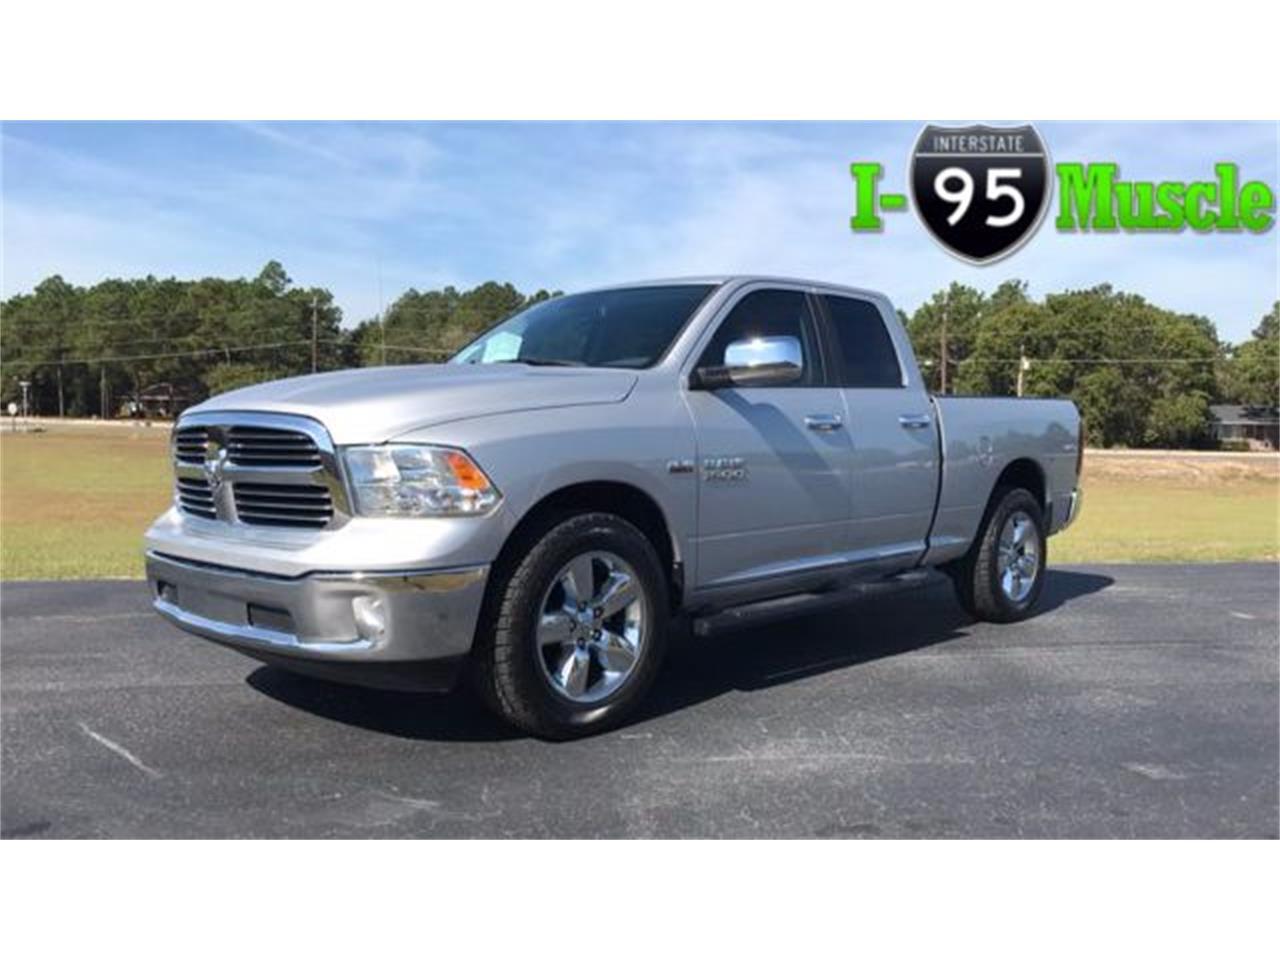 2015 Dodge Truck >> 2015 Dodge Ram 1500 For Sale Classiccars Com Cc 1041954